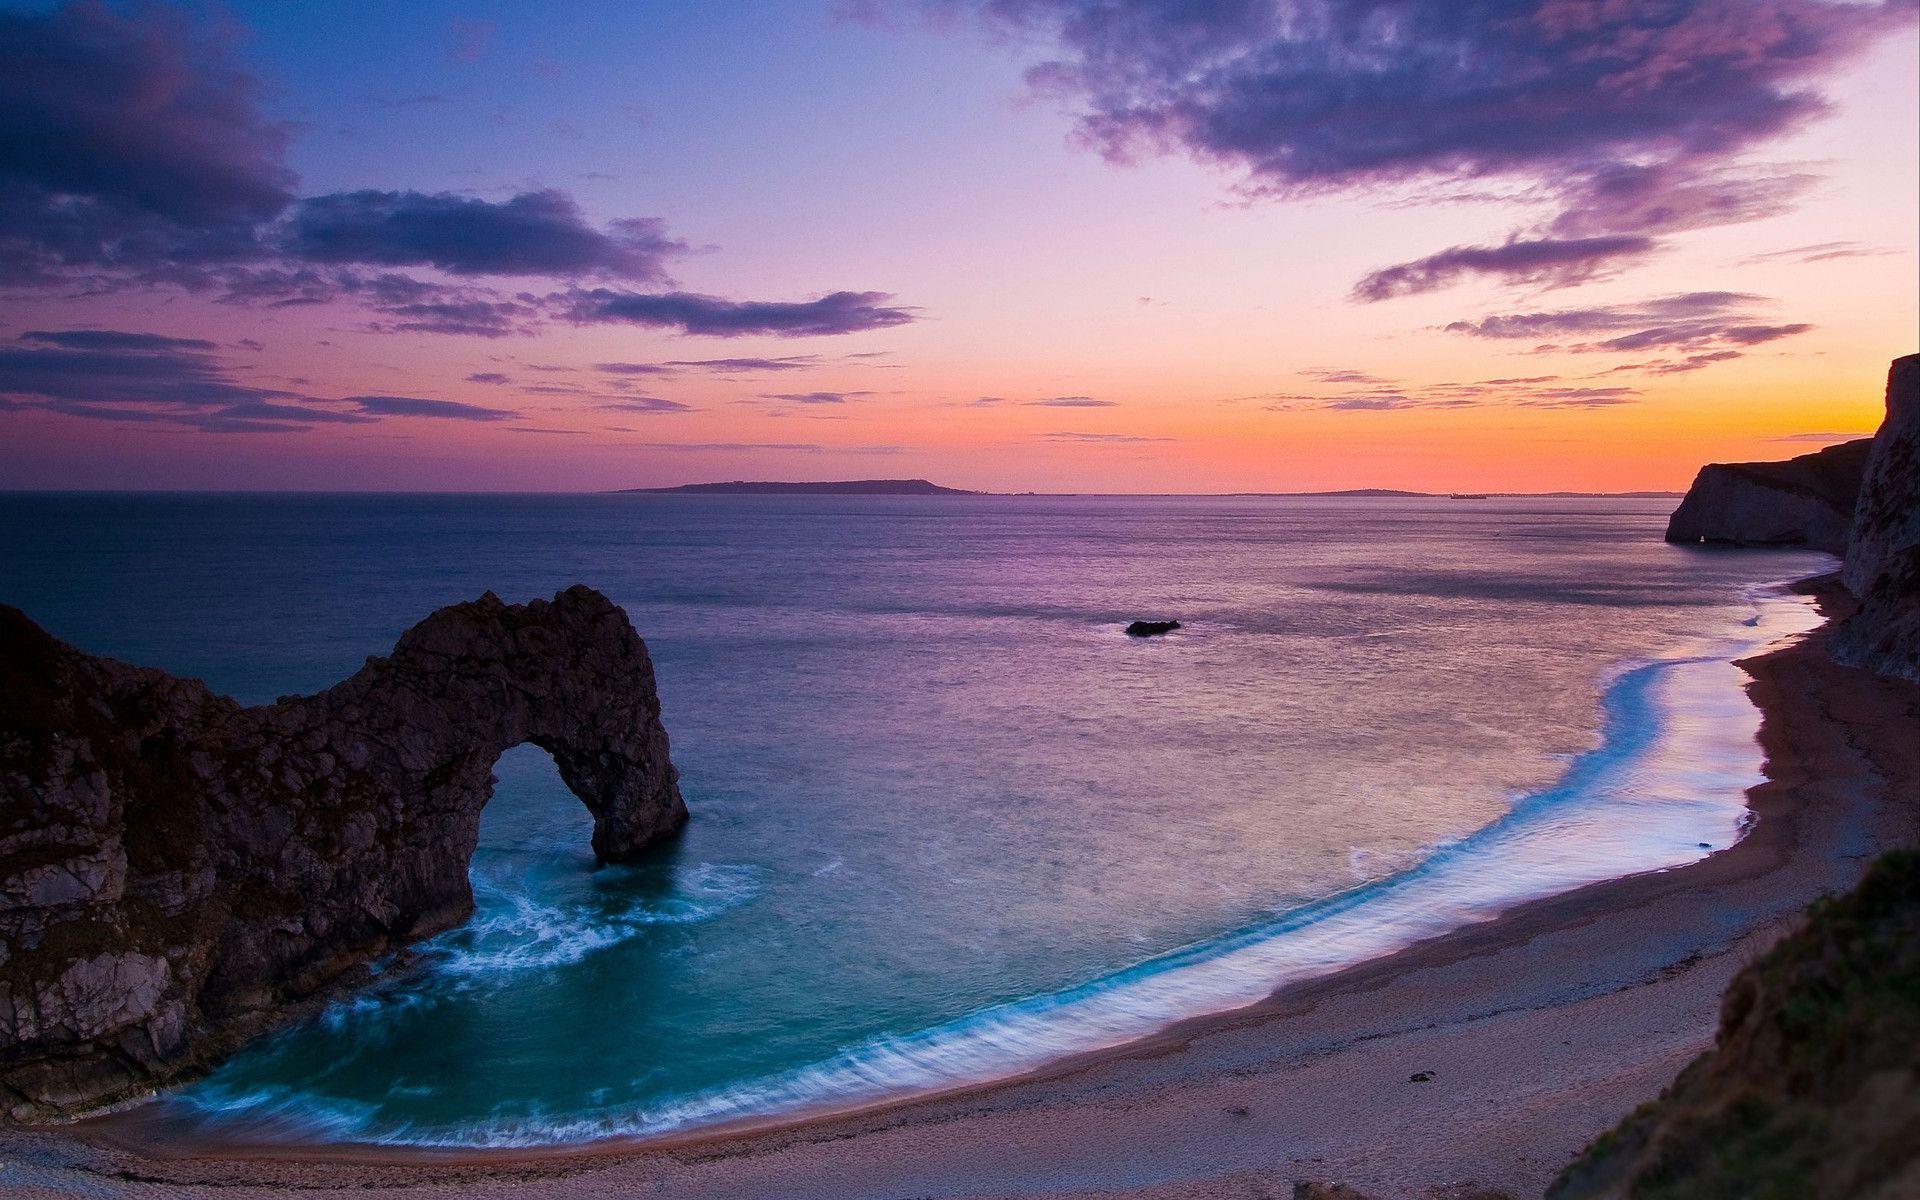 Puerto Rico Night Wallpapers Full Hd For Widescreen Wallpaper Beach Landscape Beautiful Beaches Beach Wallpaper